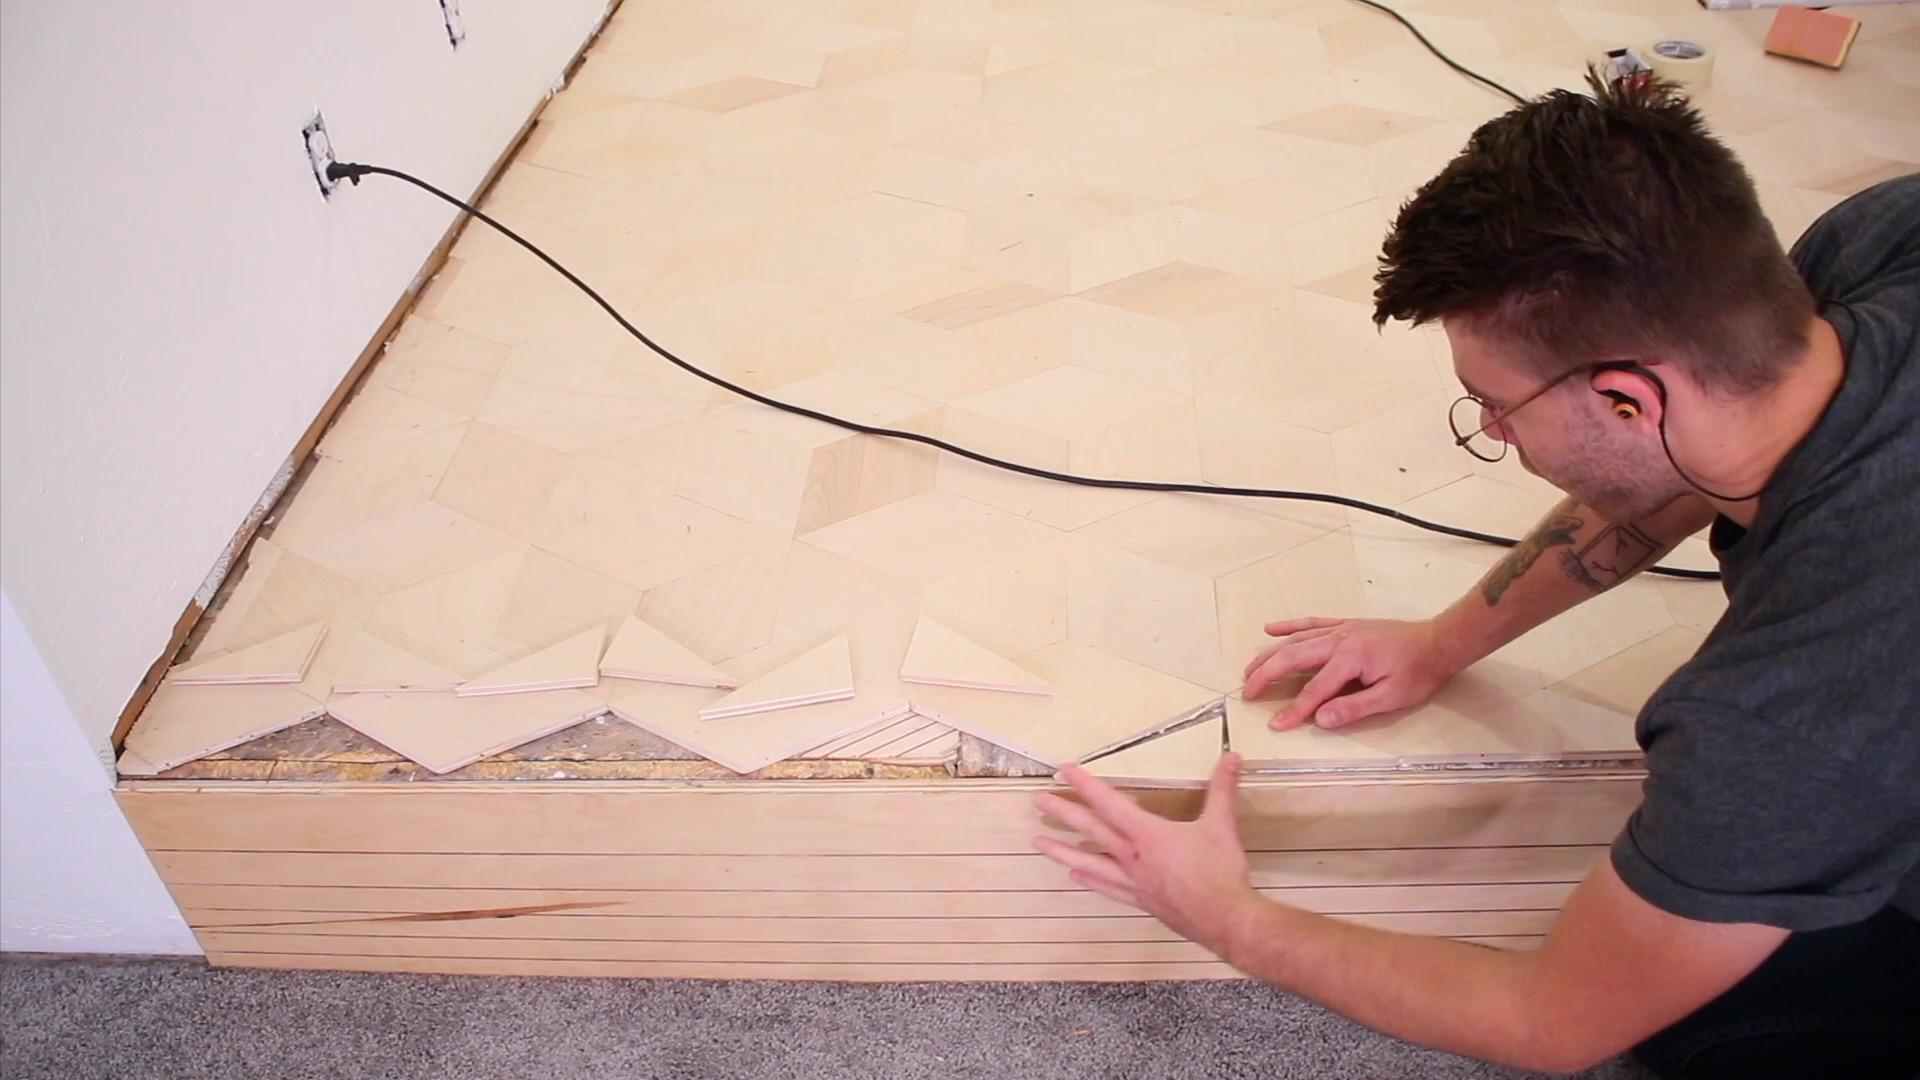 installing Custom Plywood Floors | Mike Montgomery Modern Builds